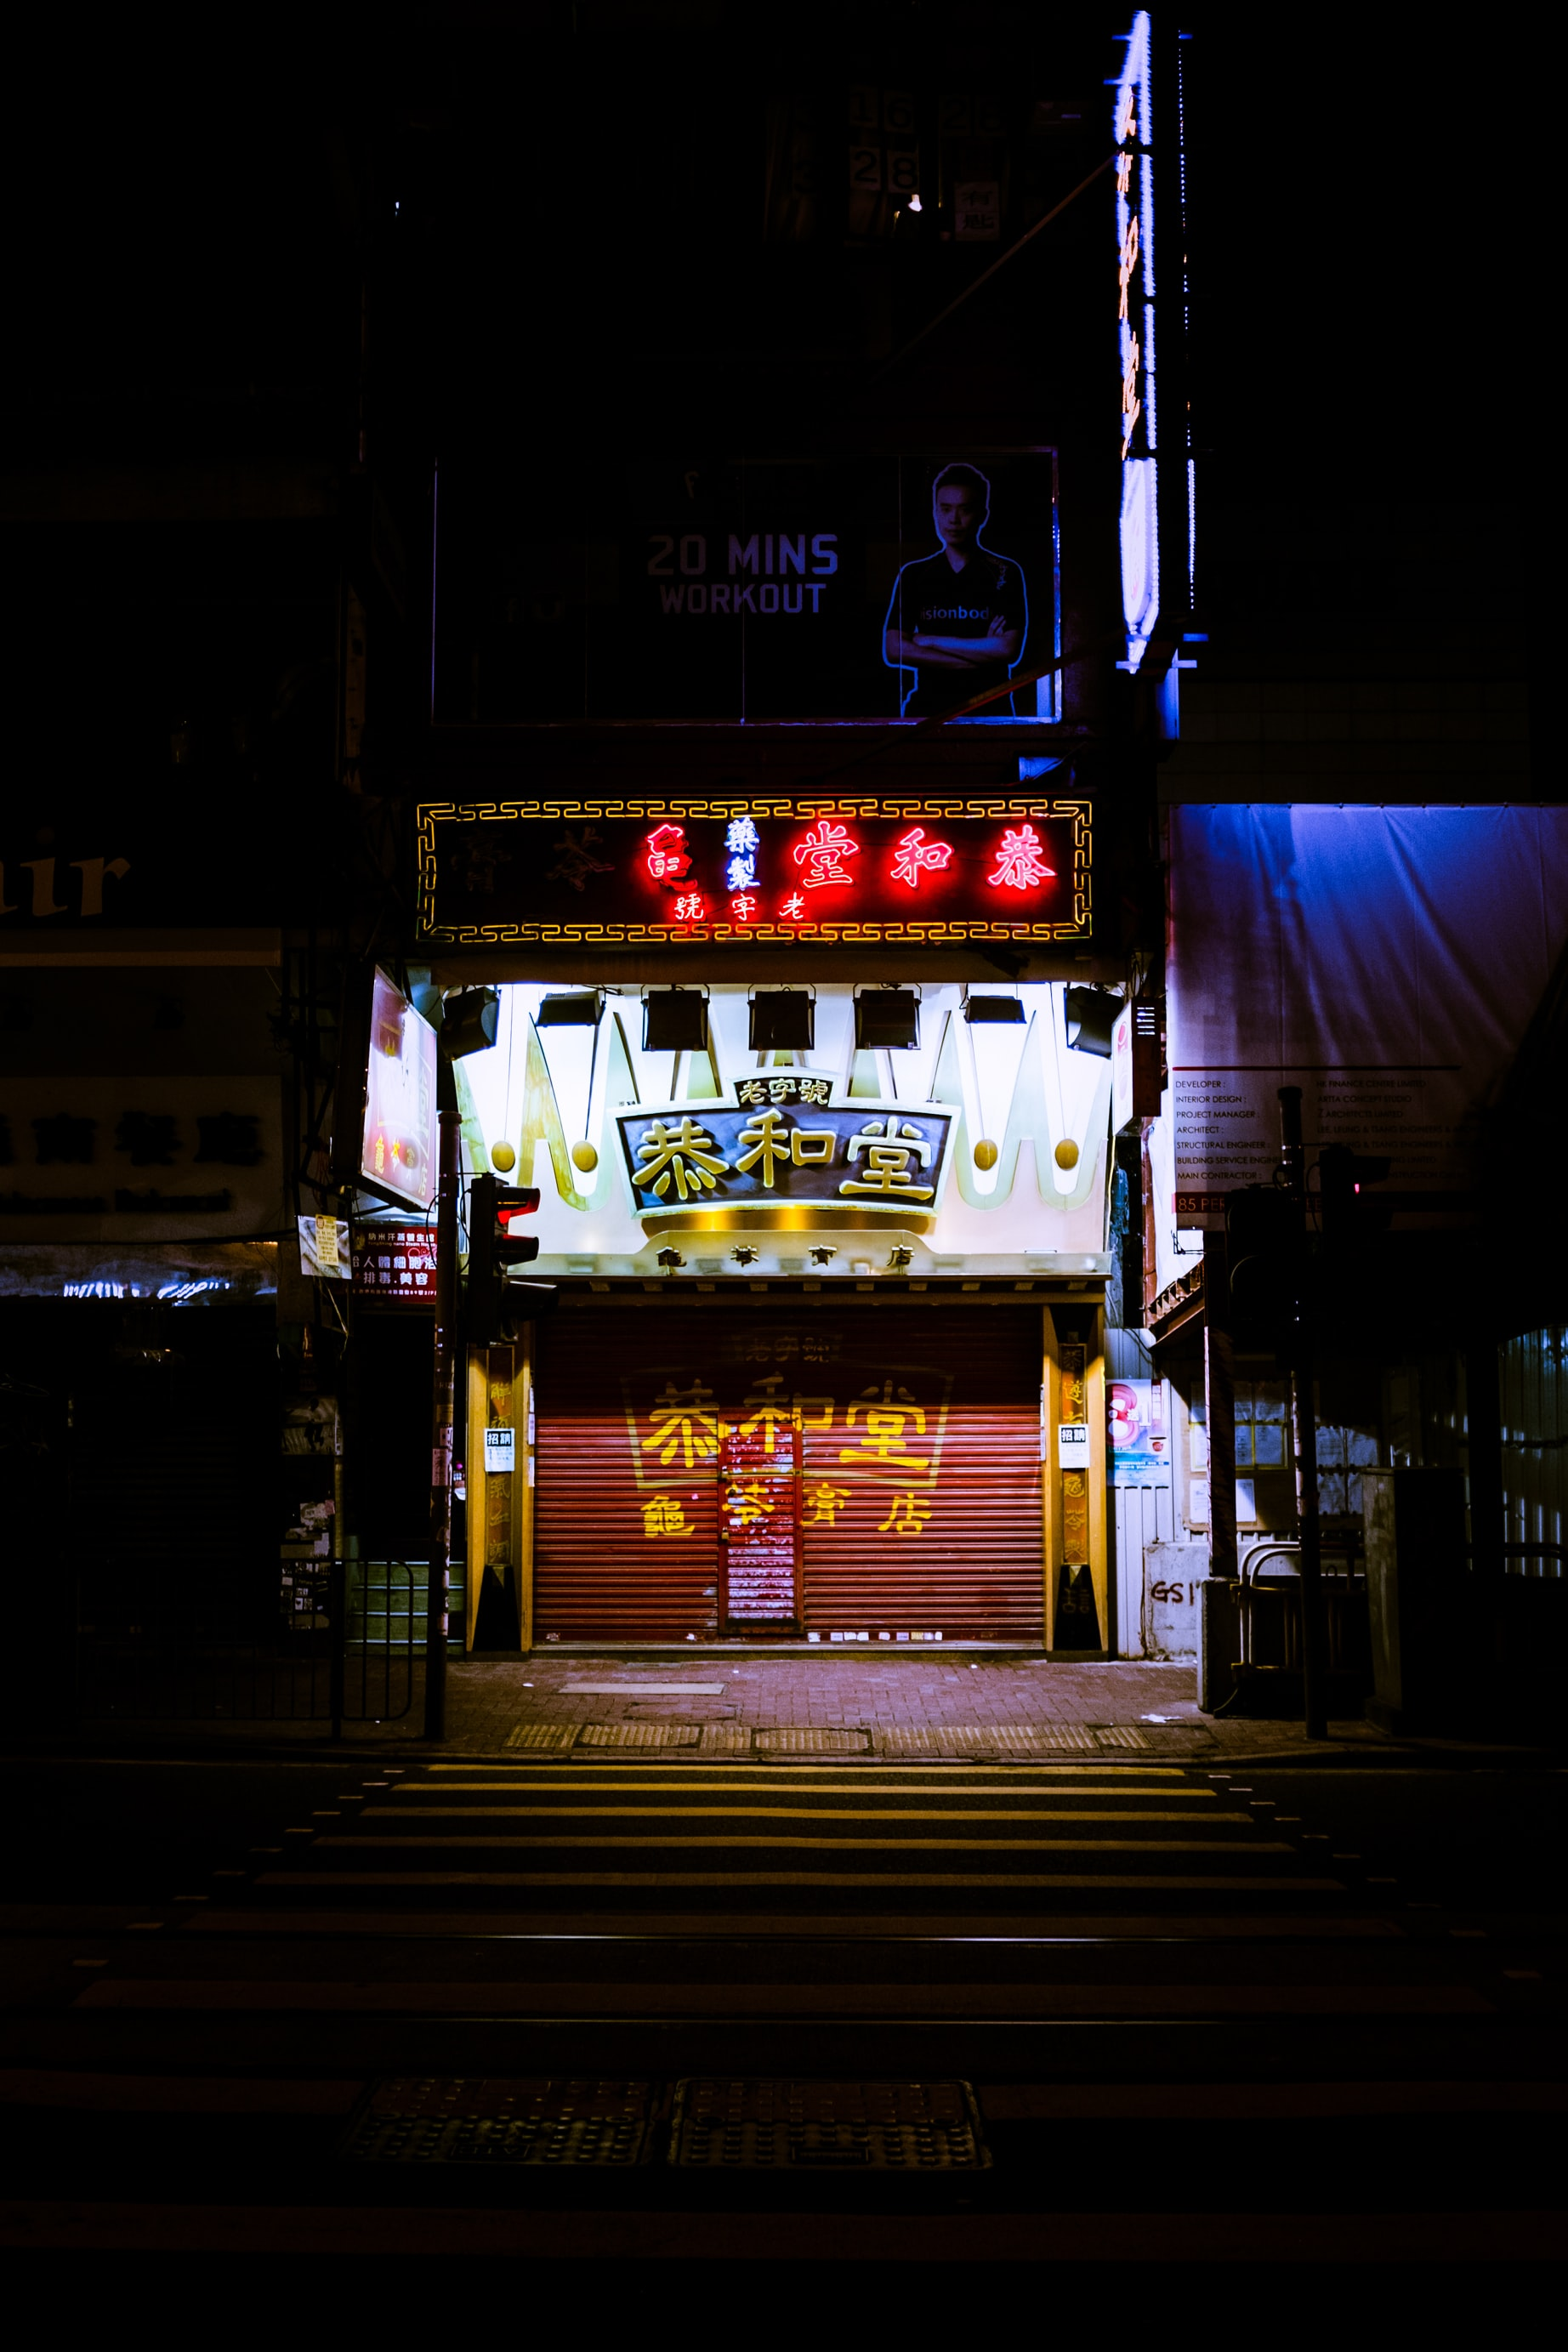 low-light photography of establishment